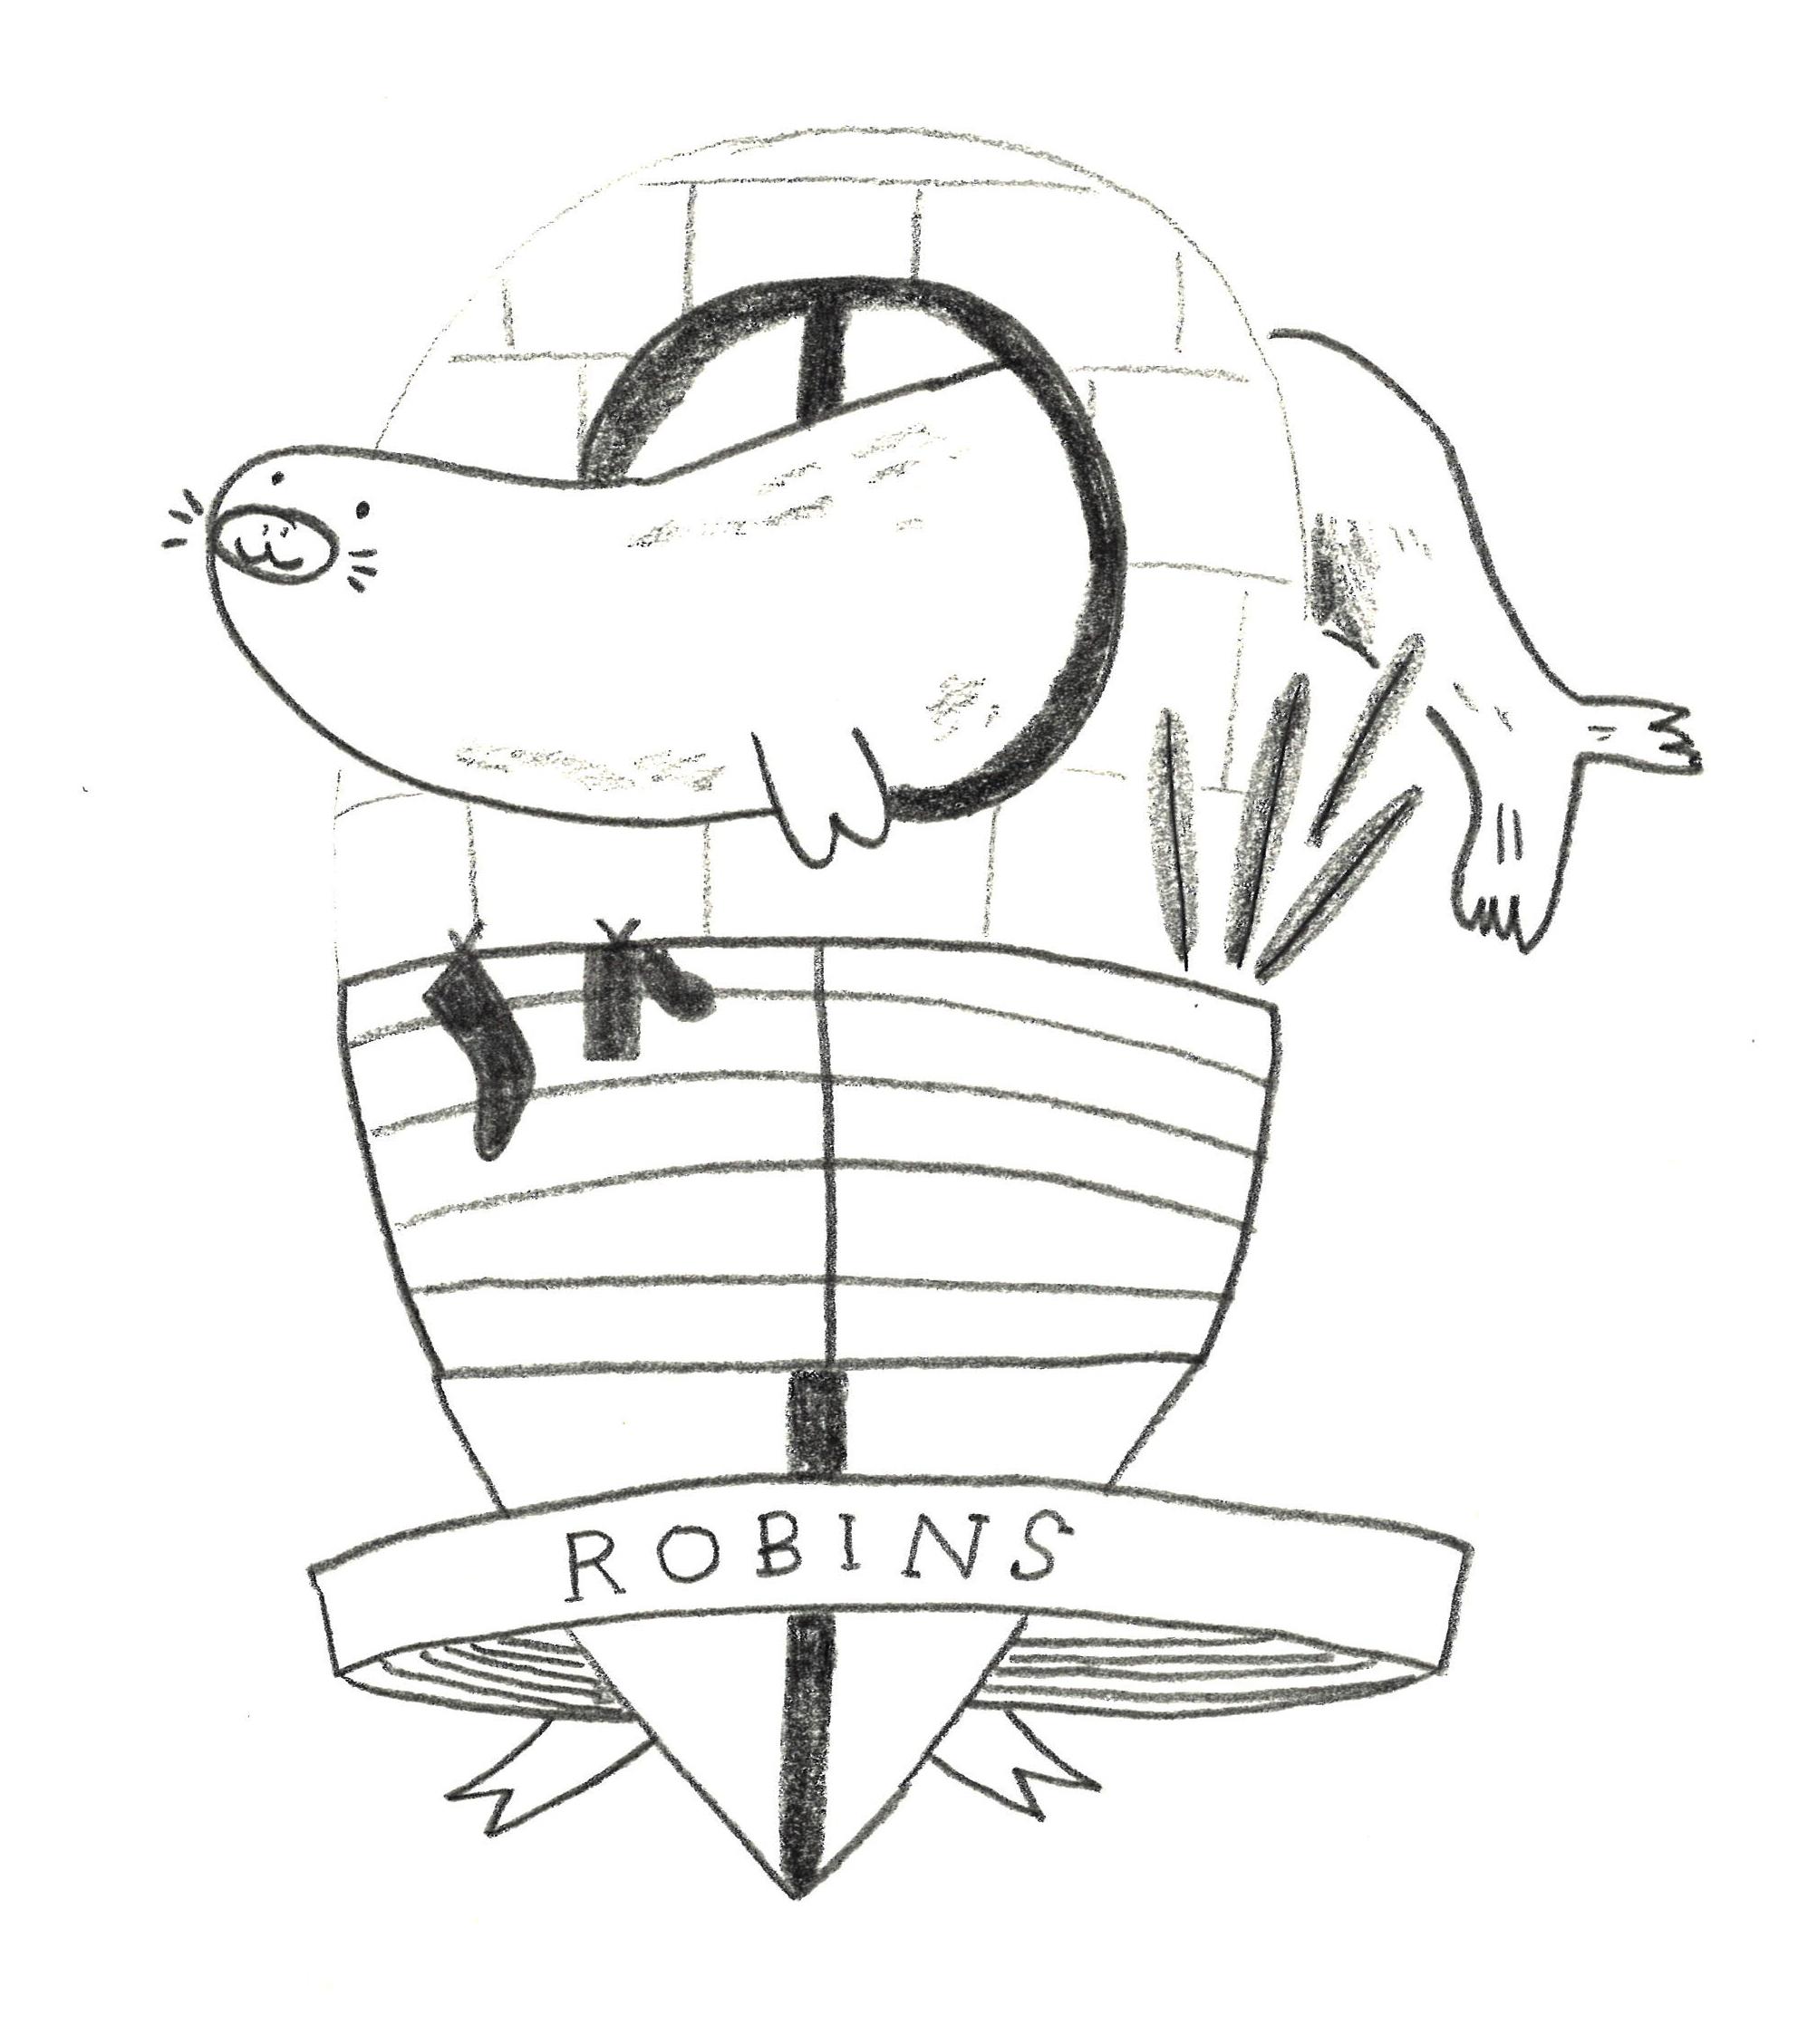 Halls Crest Robins.jpg